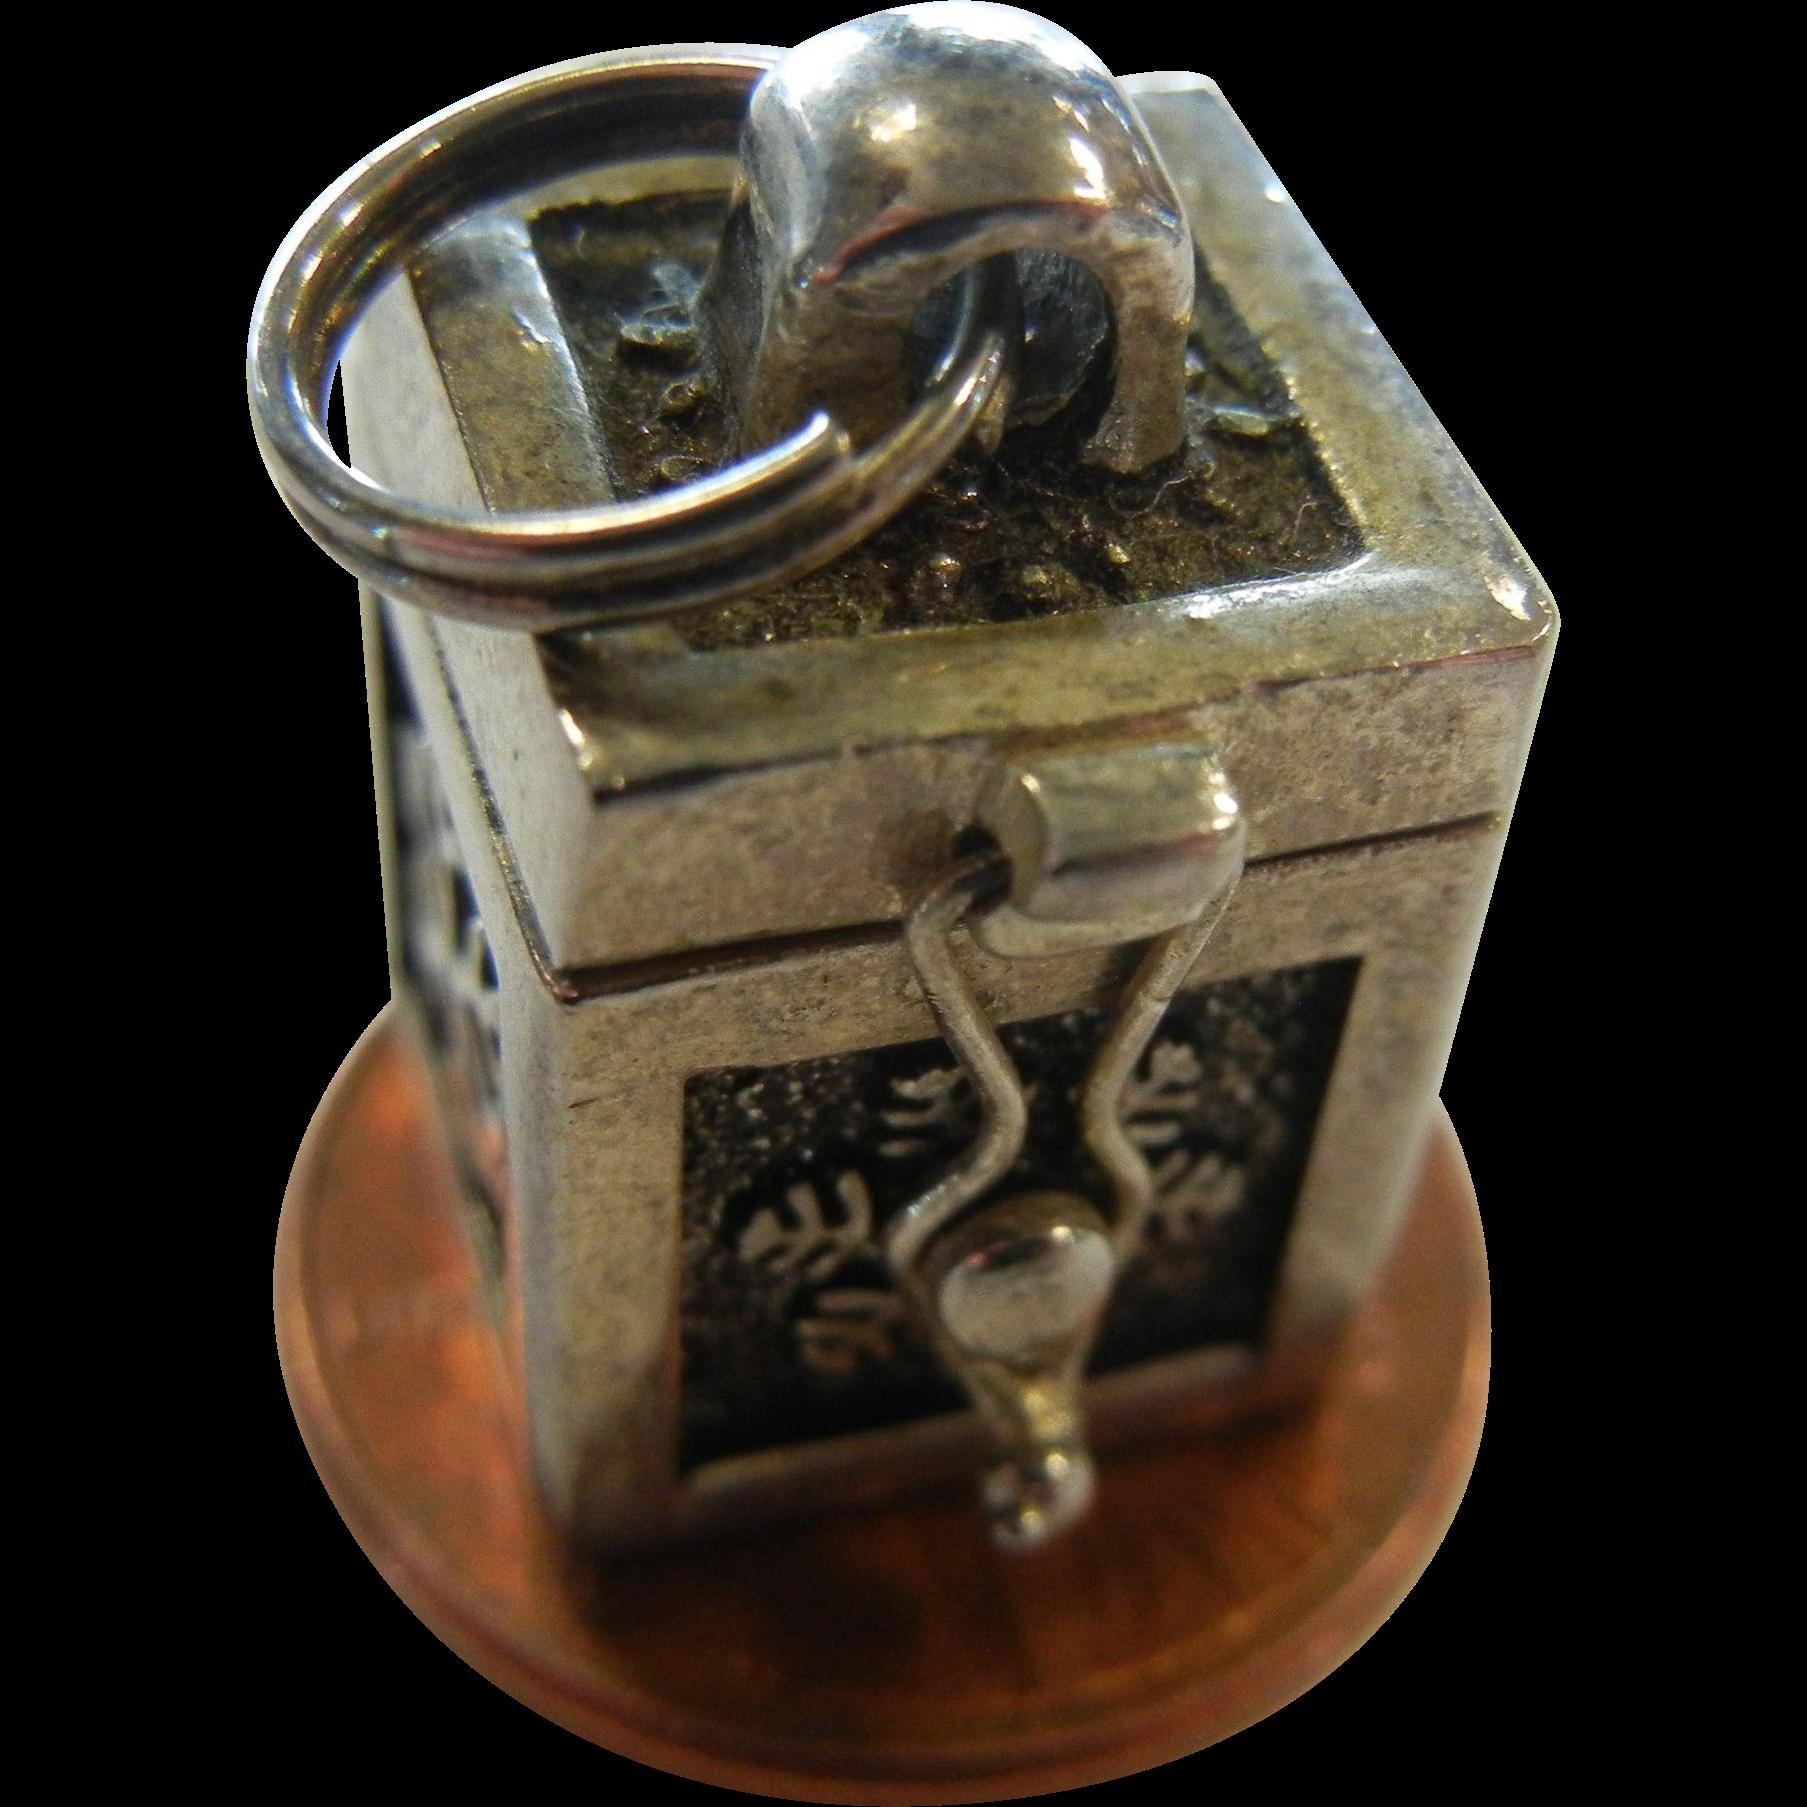 Fine Silver-Tone Keepsake Box Charm